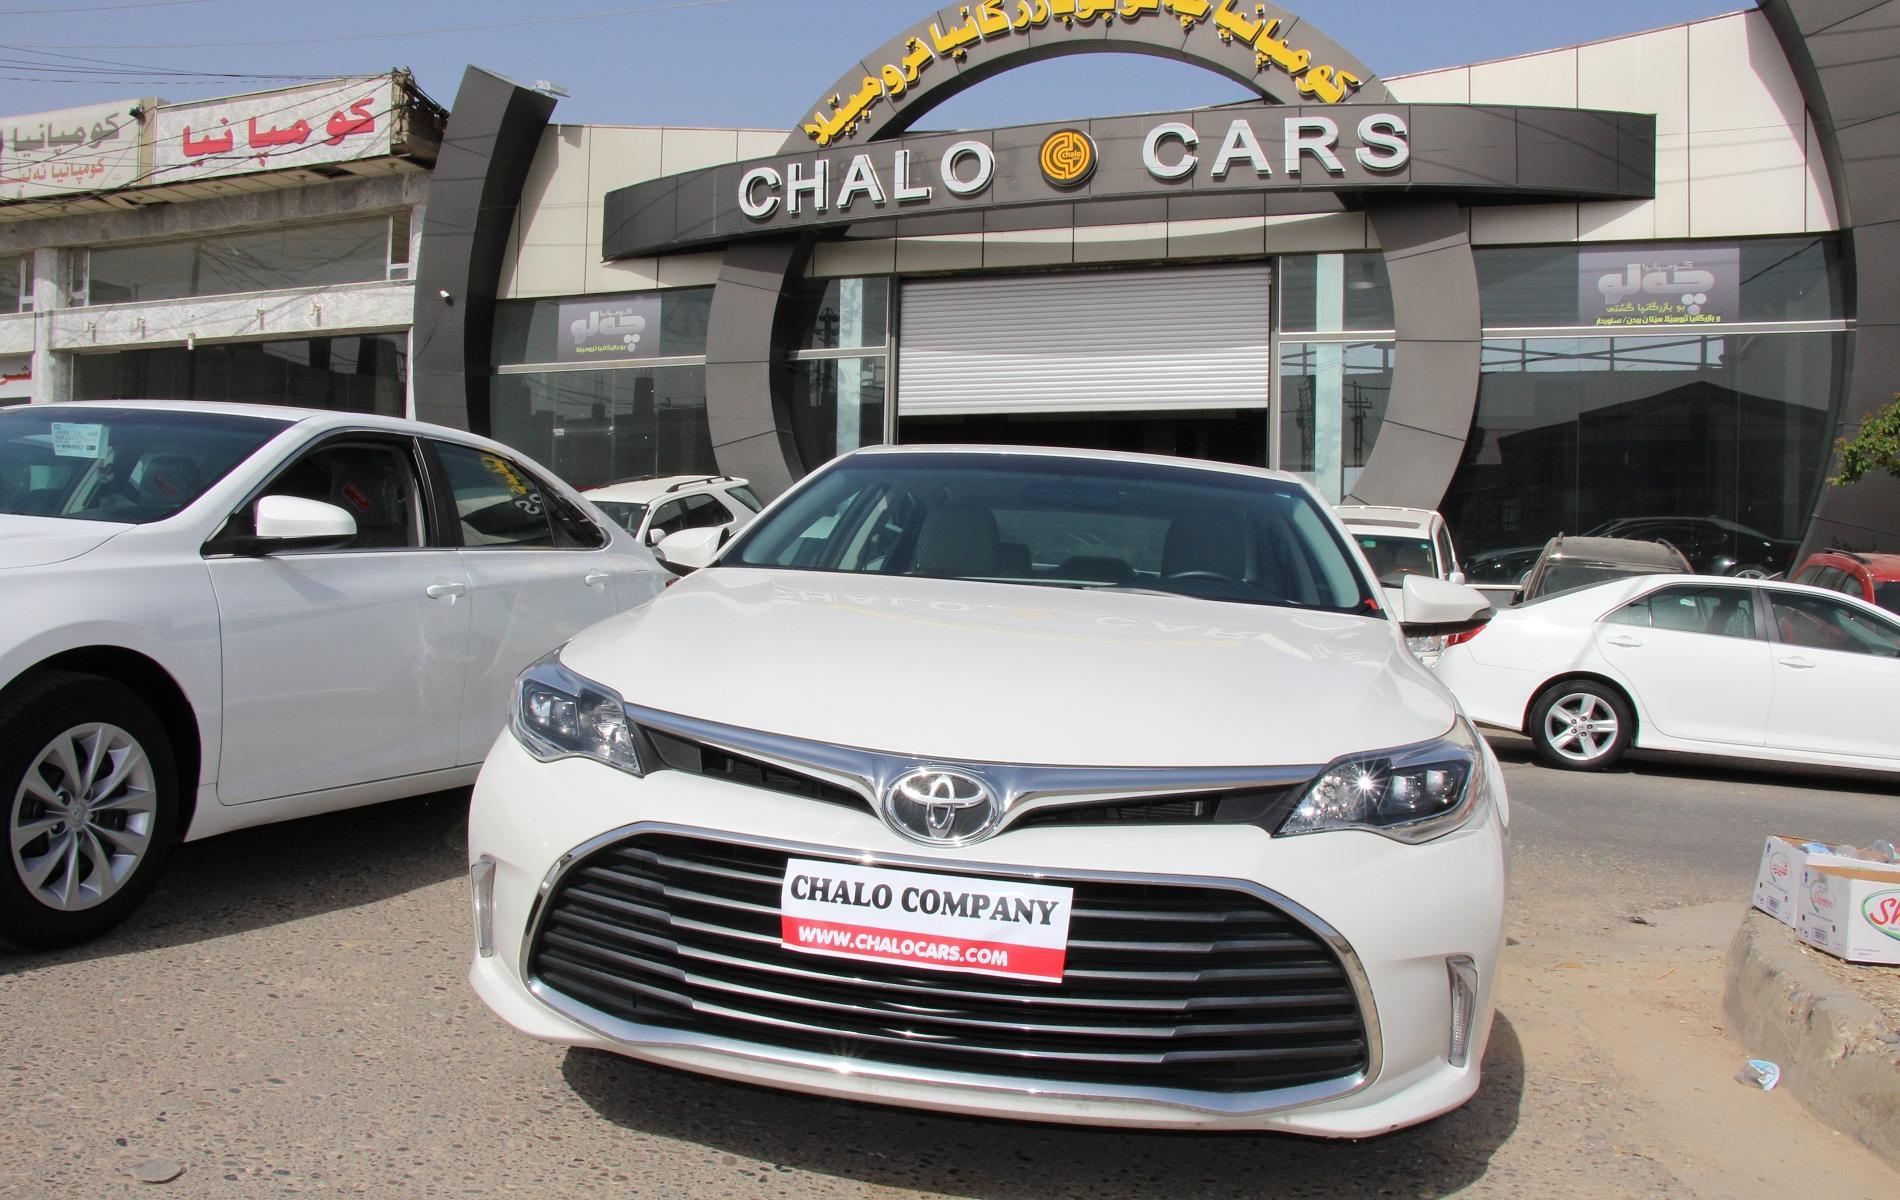 Chalo Car Service